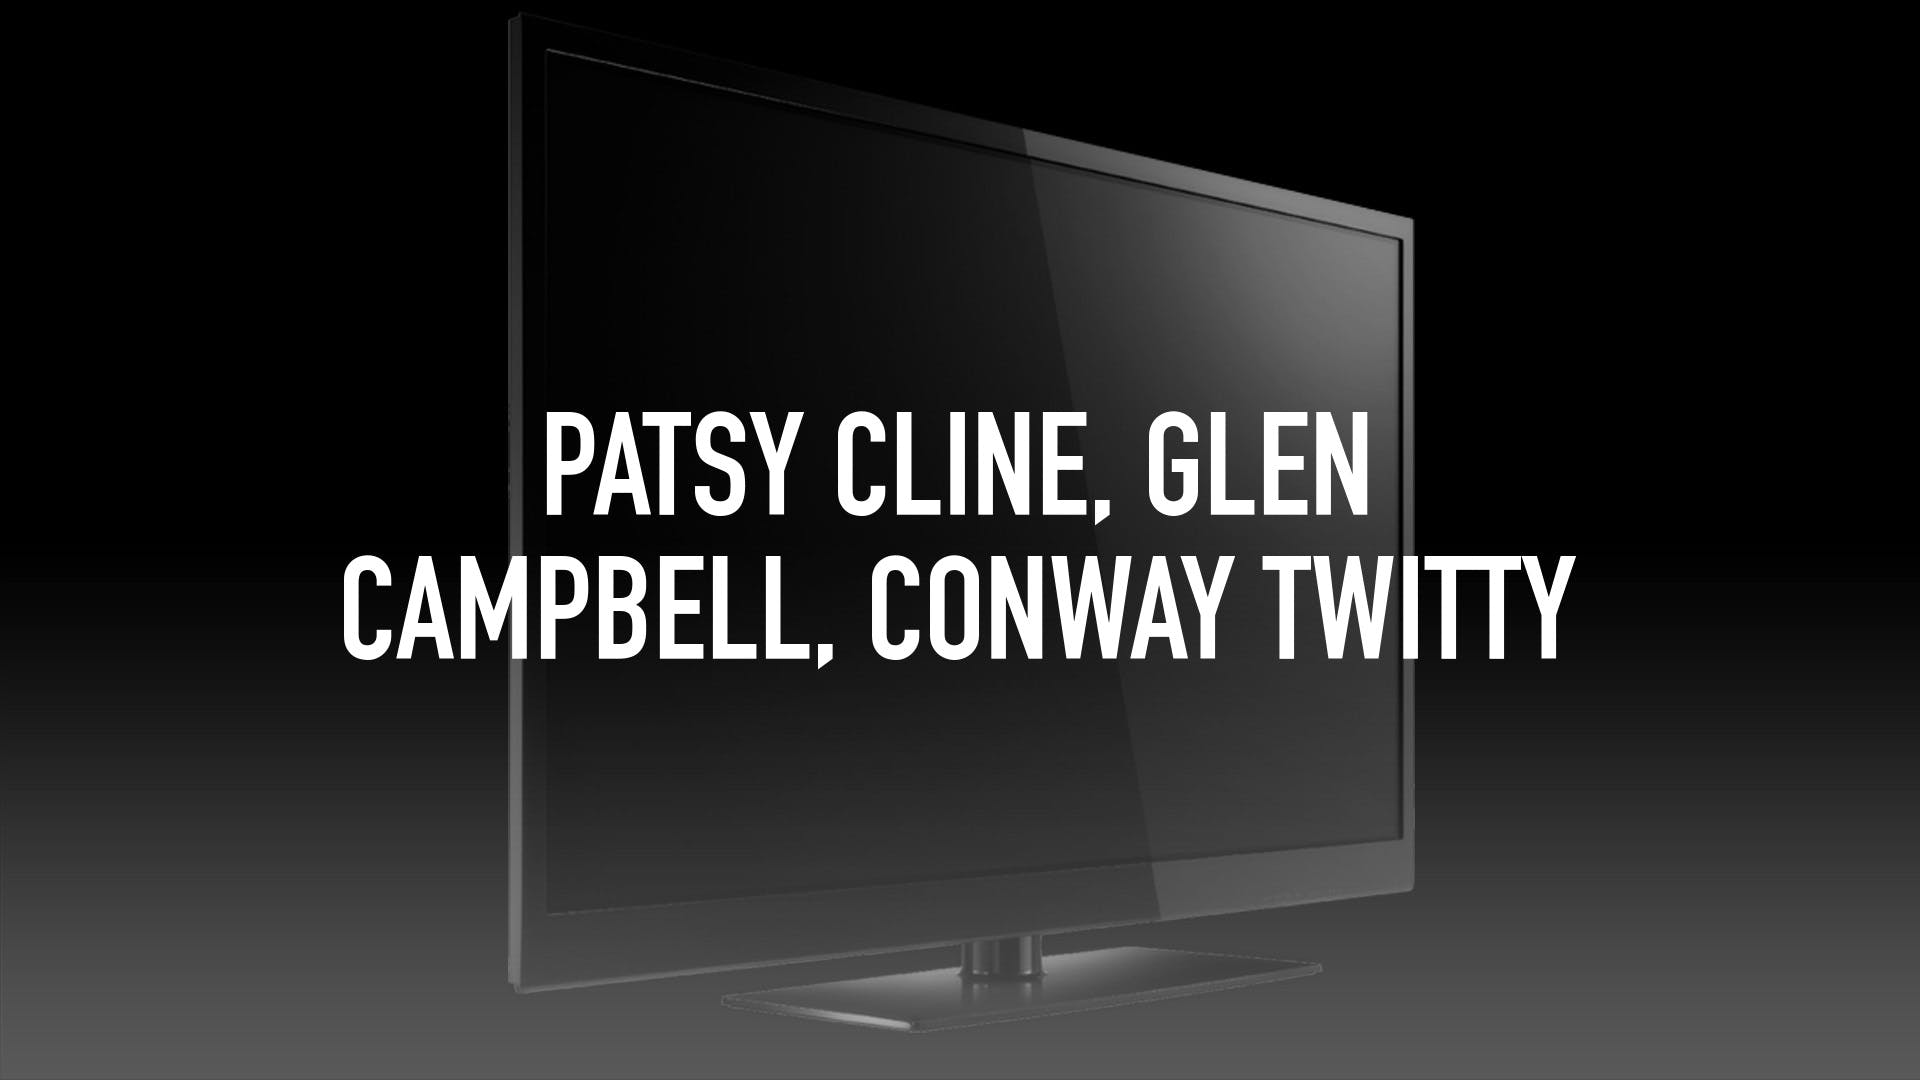 Watch Patsy Cline, Glen Campbell, Conway Twitty | Stream on fuboTV